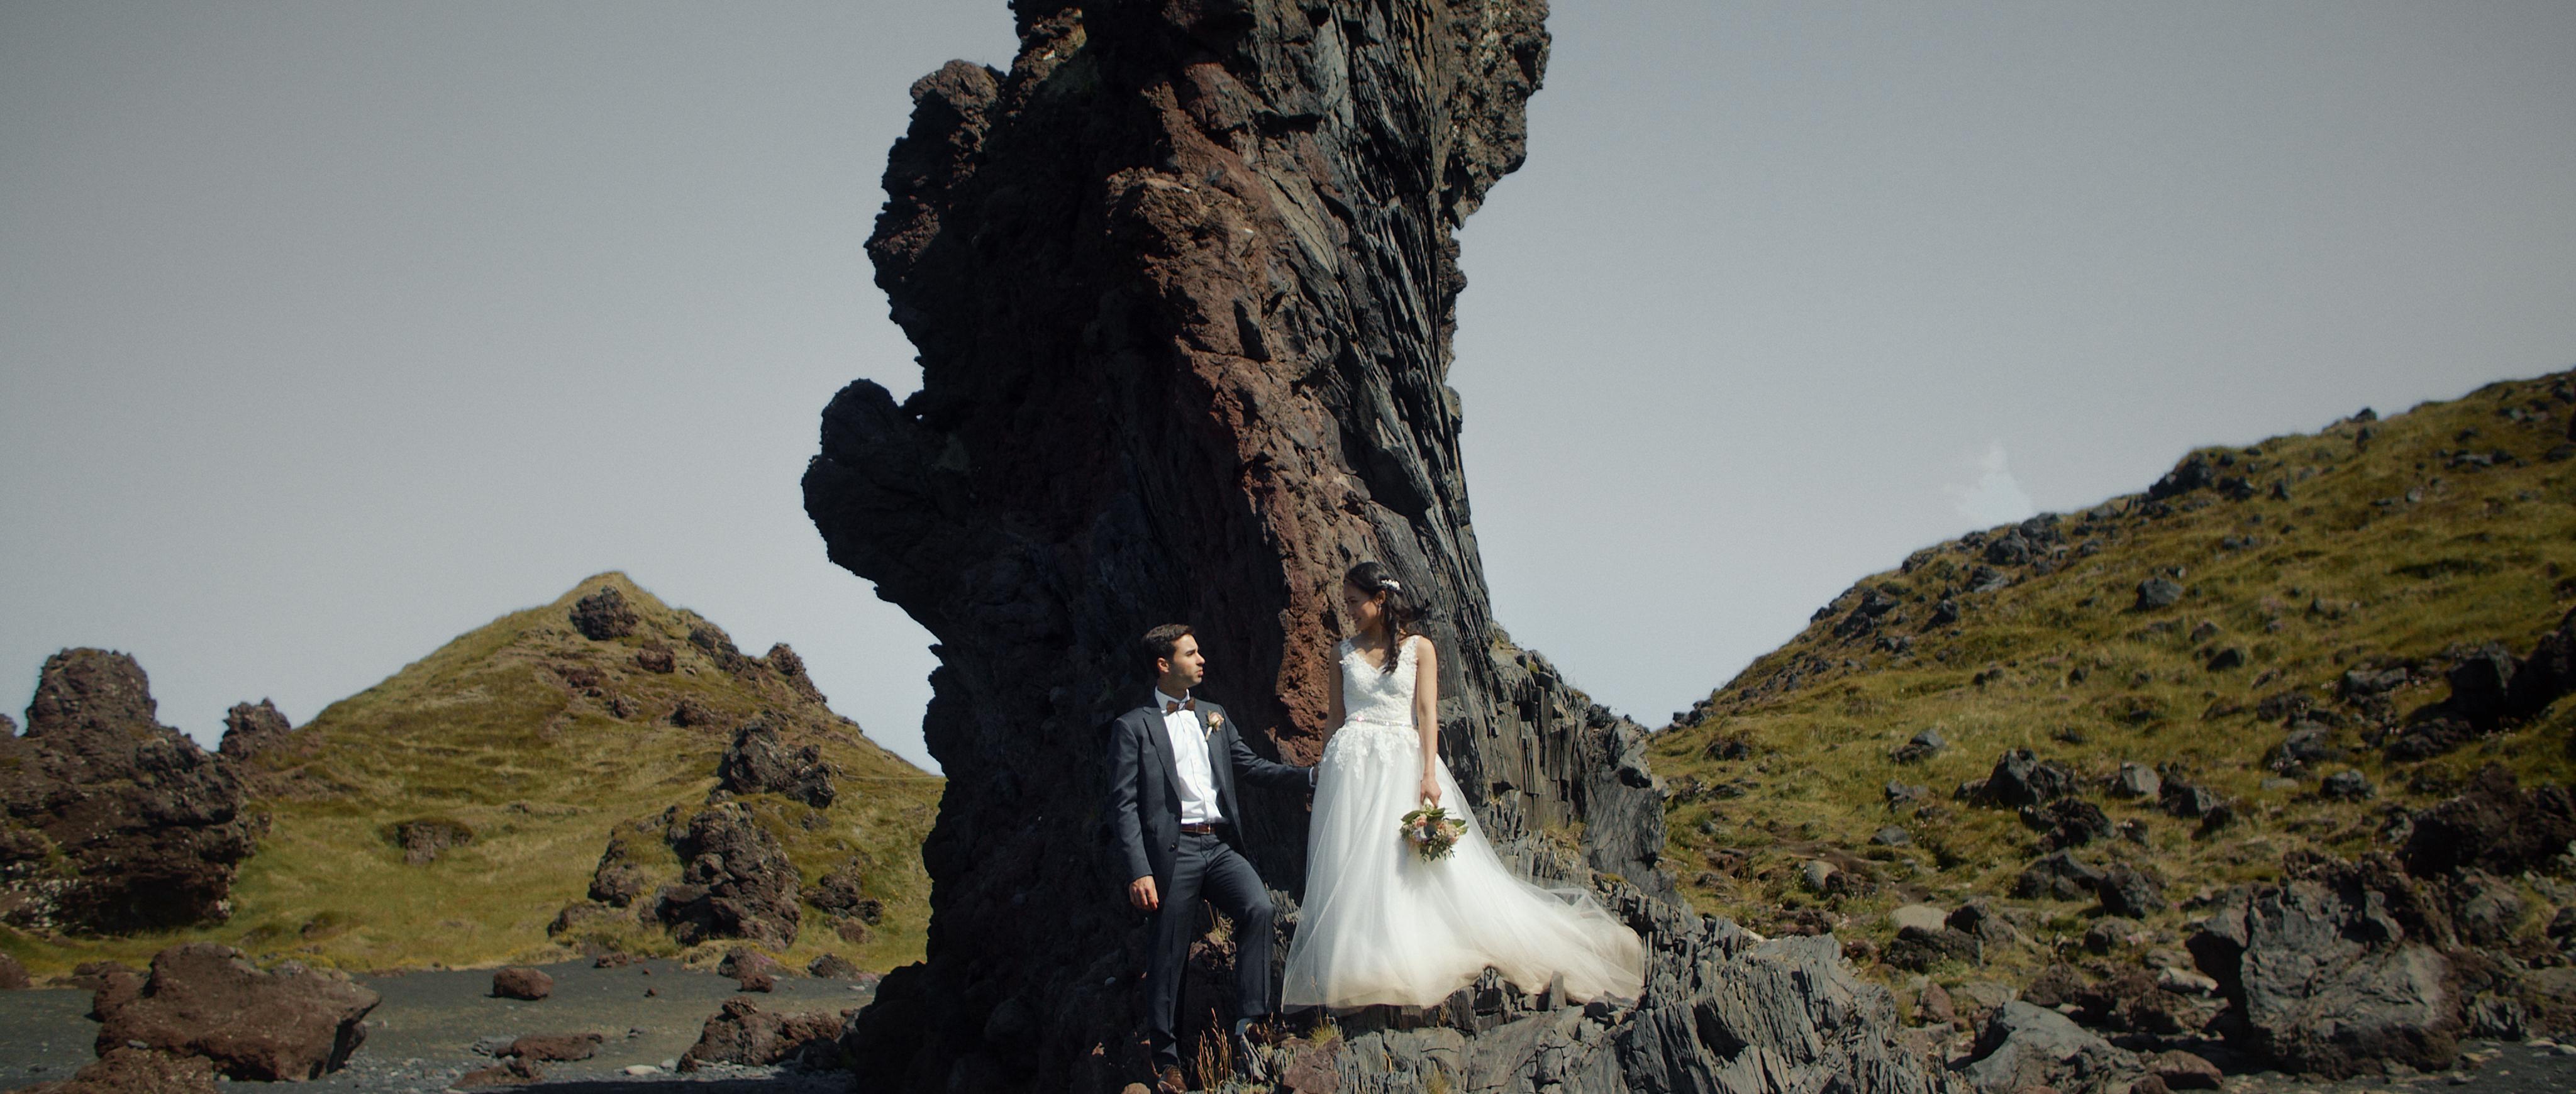 Jenn + Matt | Djúpavík, Iceland | a beach